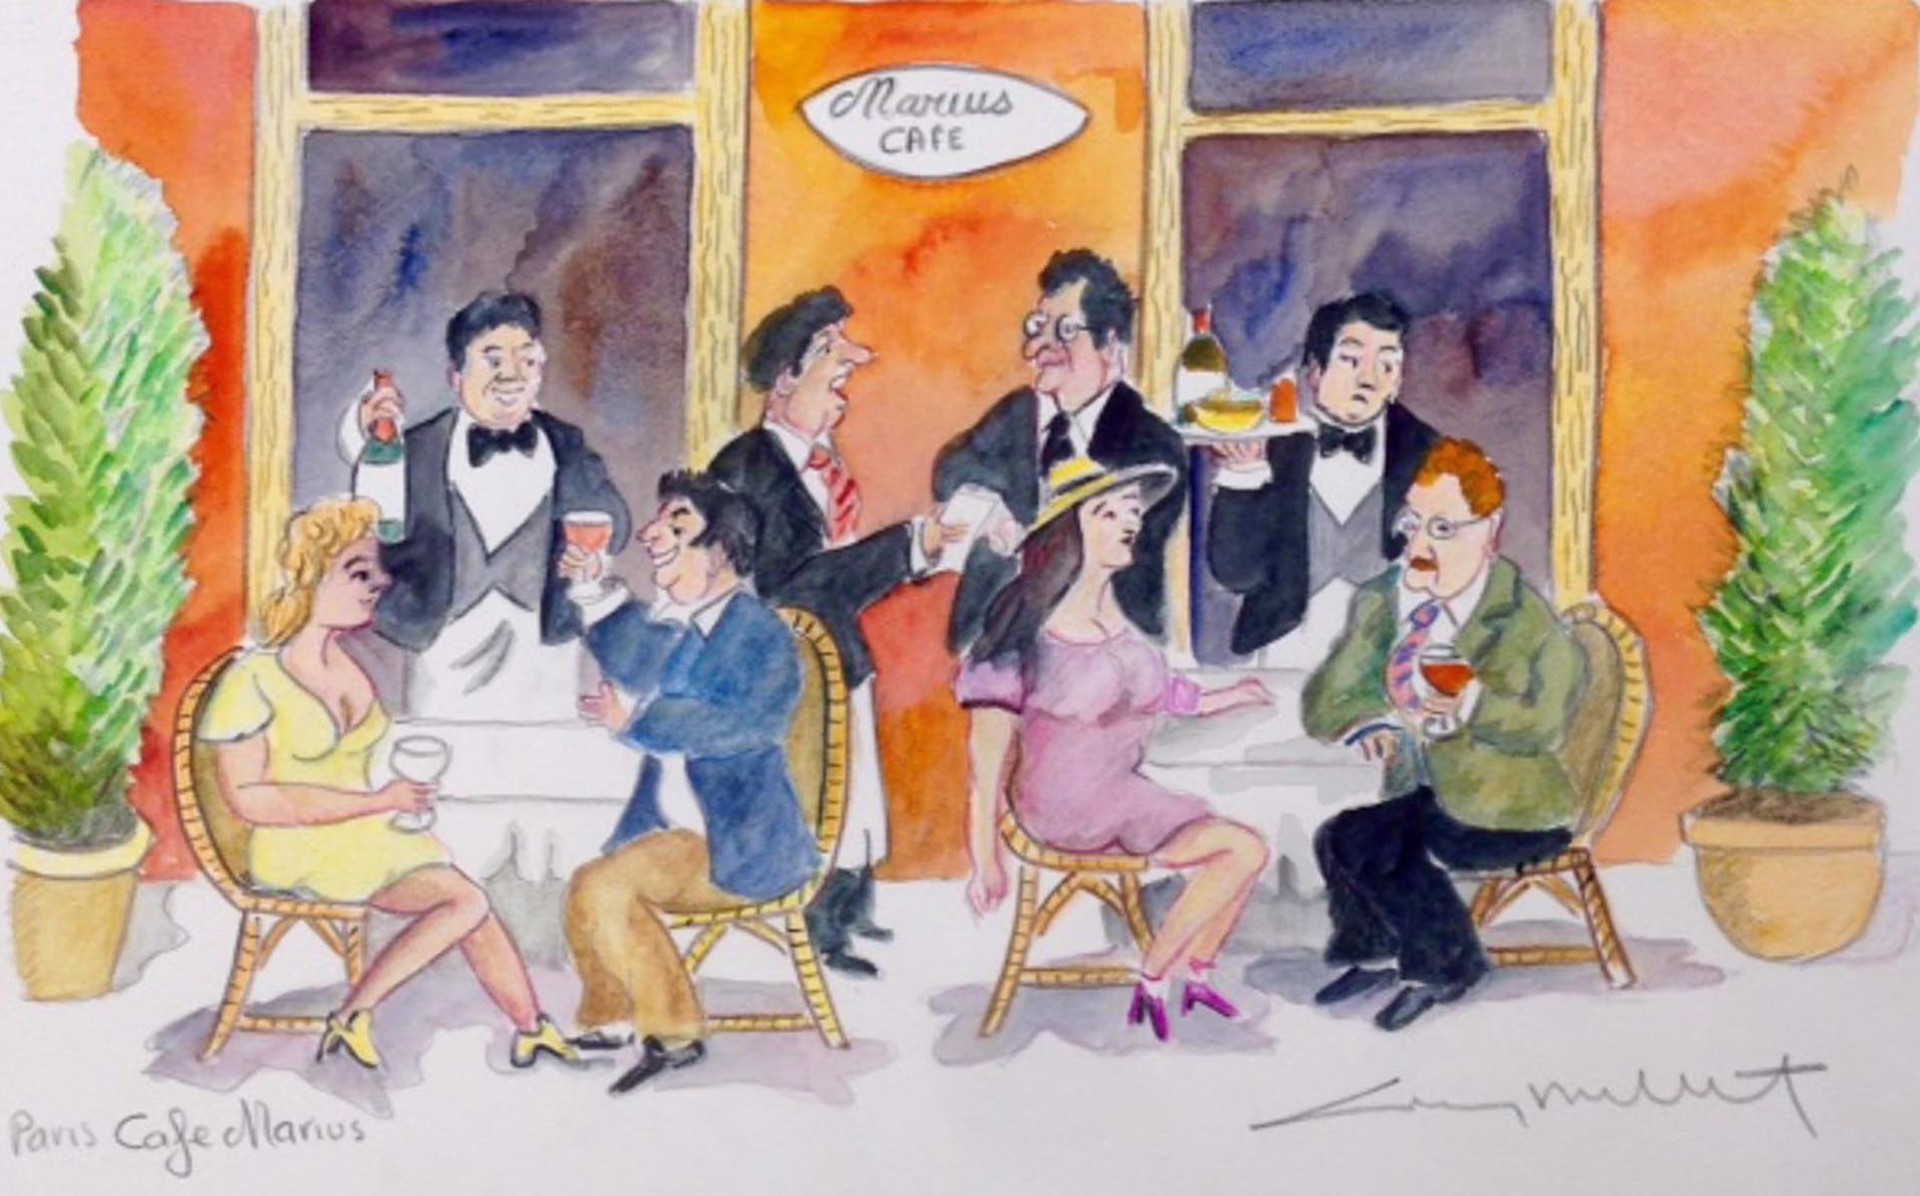 Paris Cafe Marius by Guy Buffet